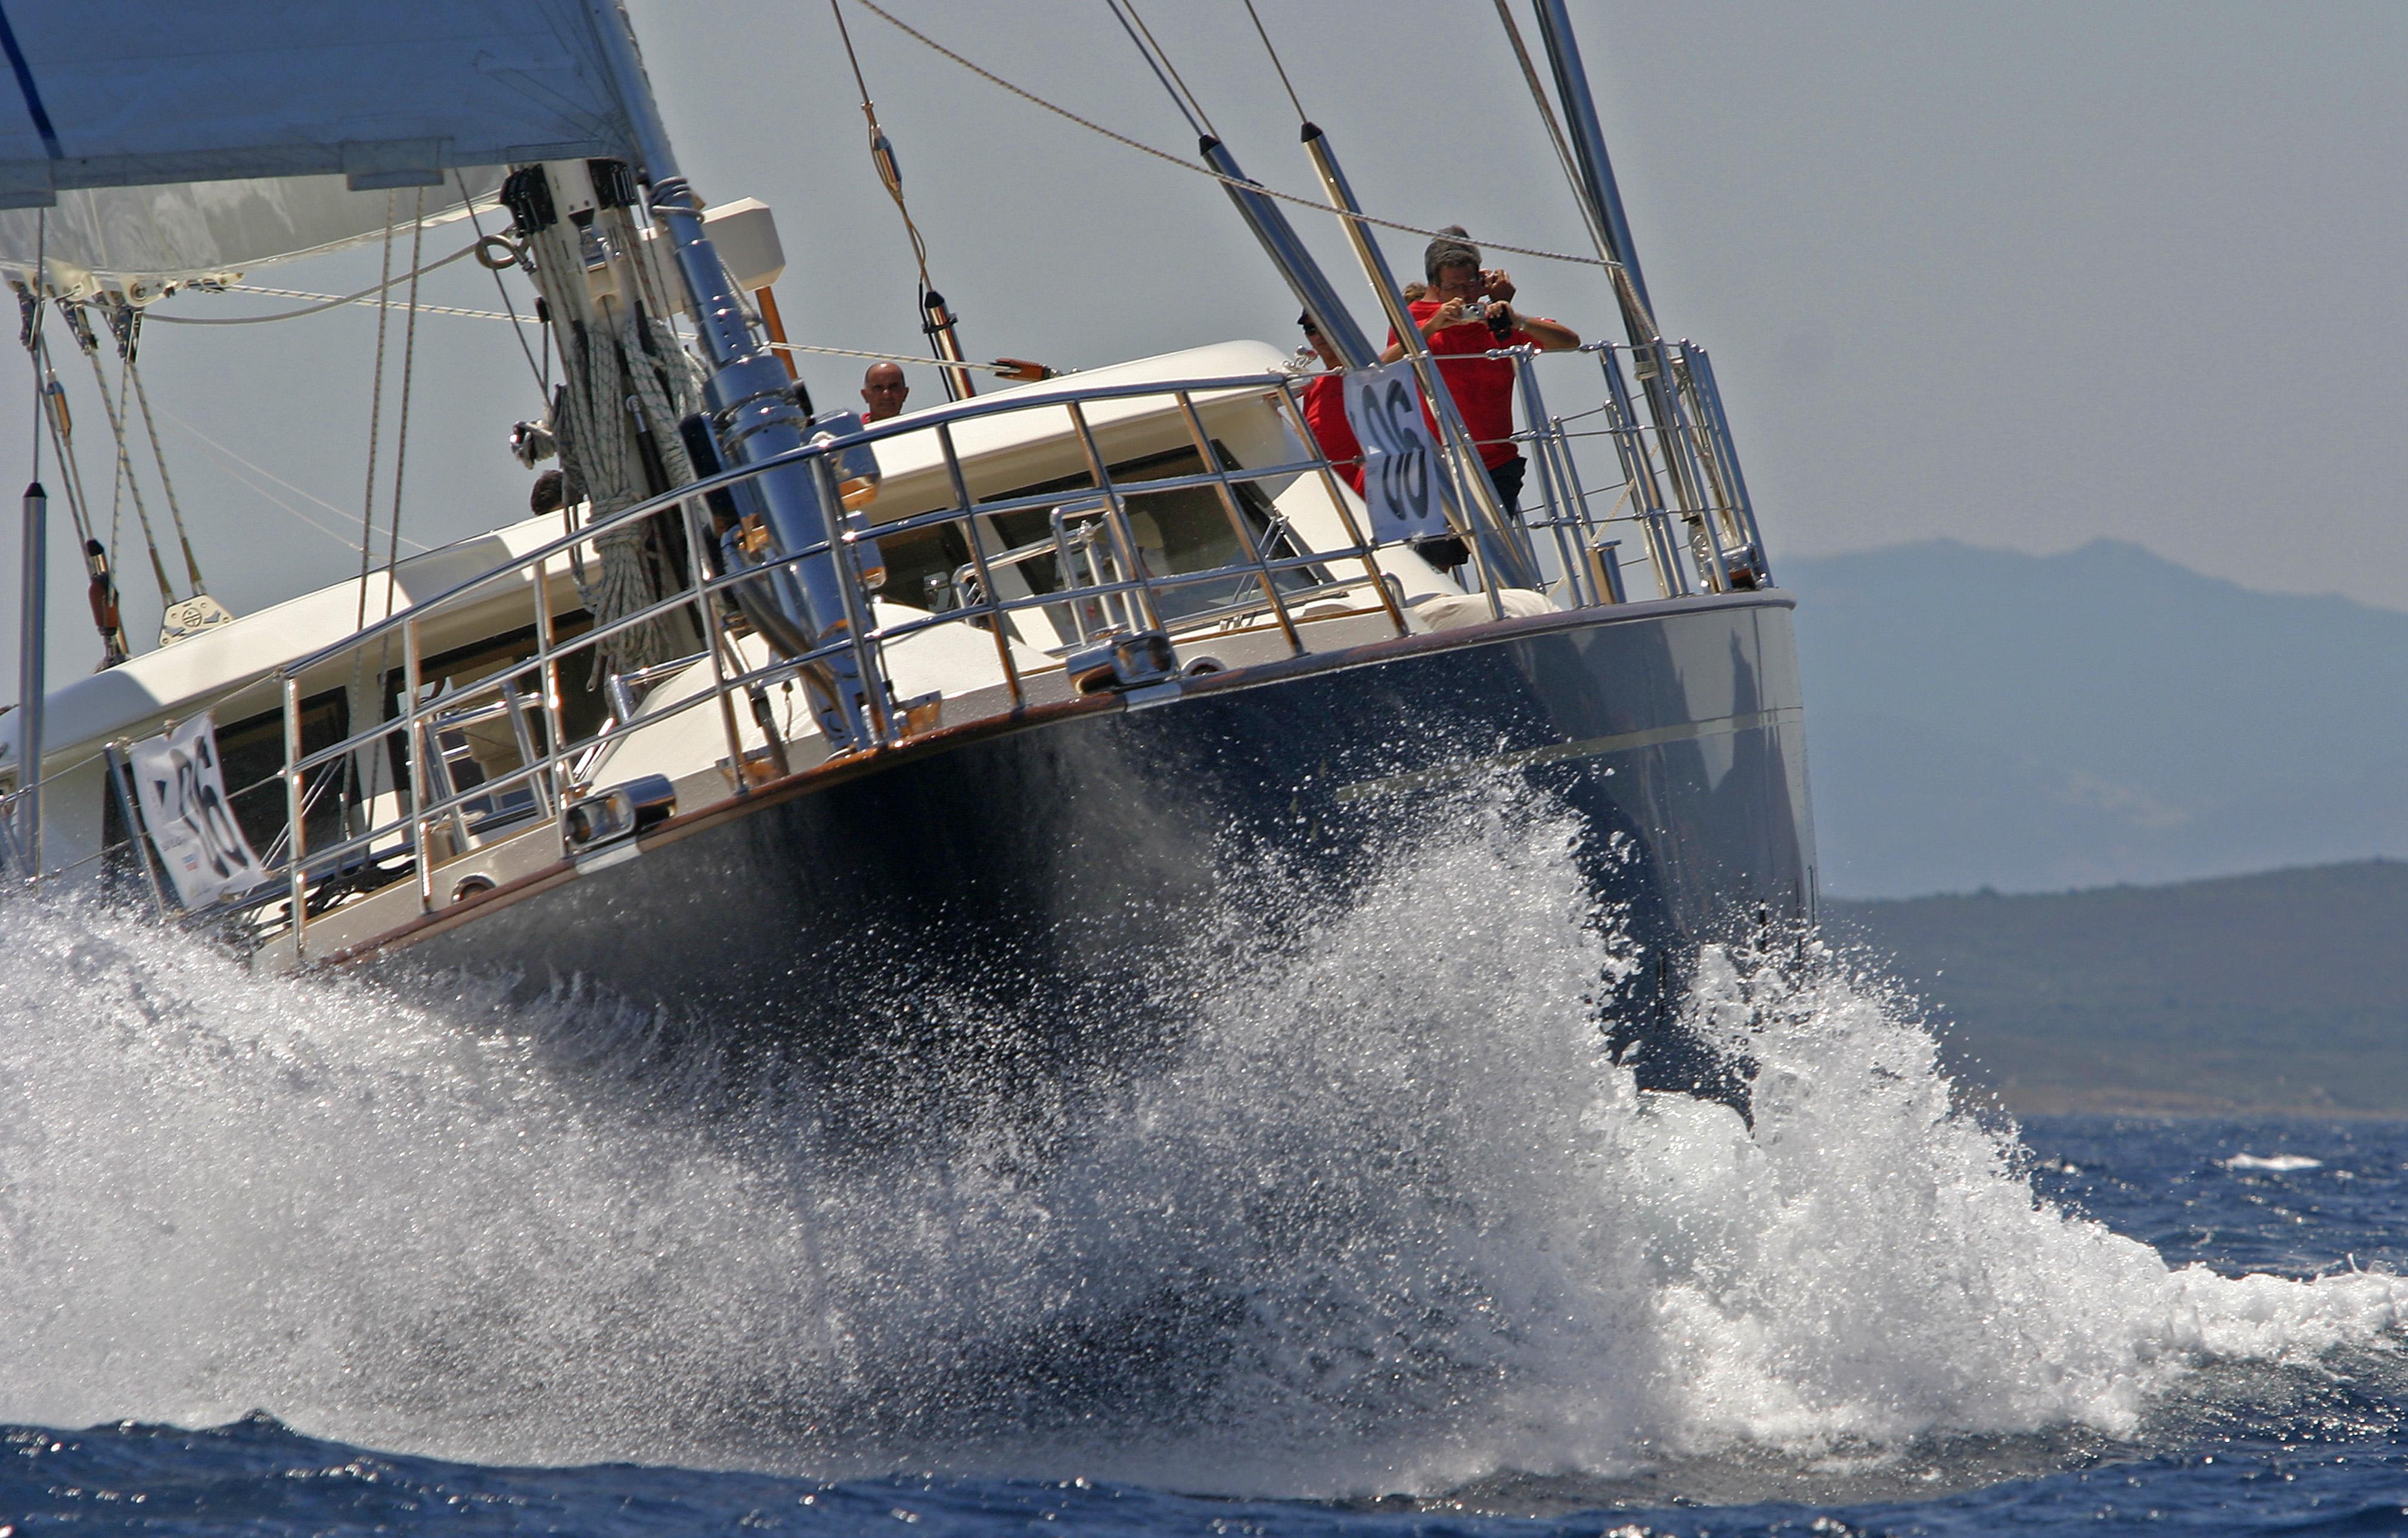 Yacht Heritage M By Pereni Navi - Sailing